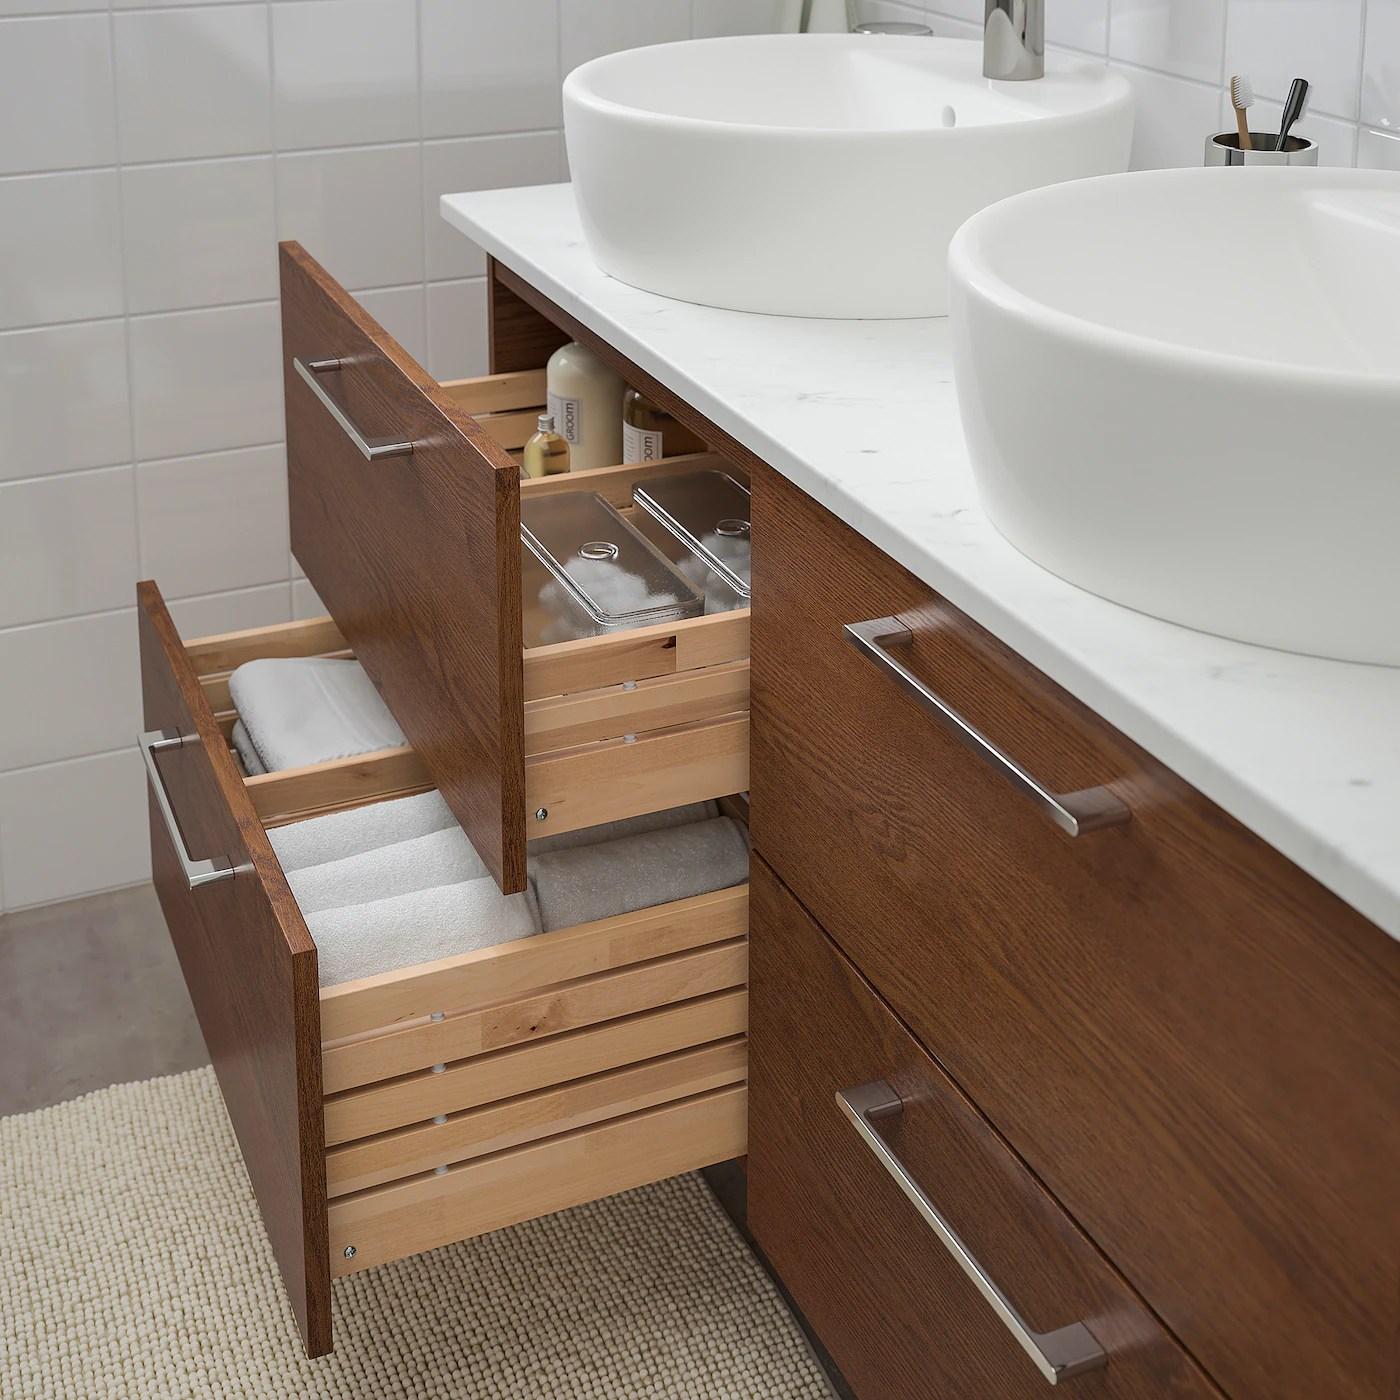 Godmorgon Tolken Tornviken Bathroom Vanity Brown Stained Ash Effect Marble Effect Dalskar Faucet Ikea Canada Ikea